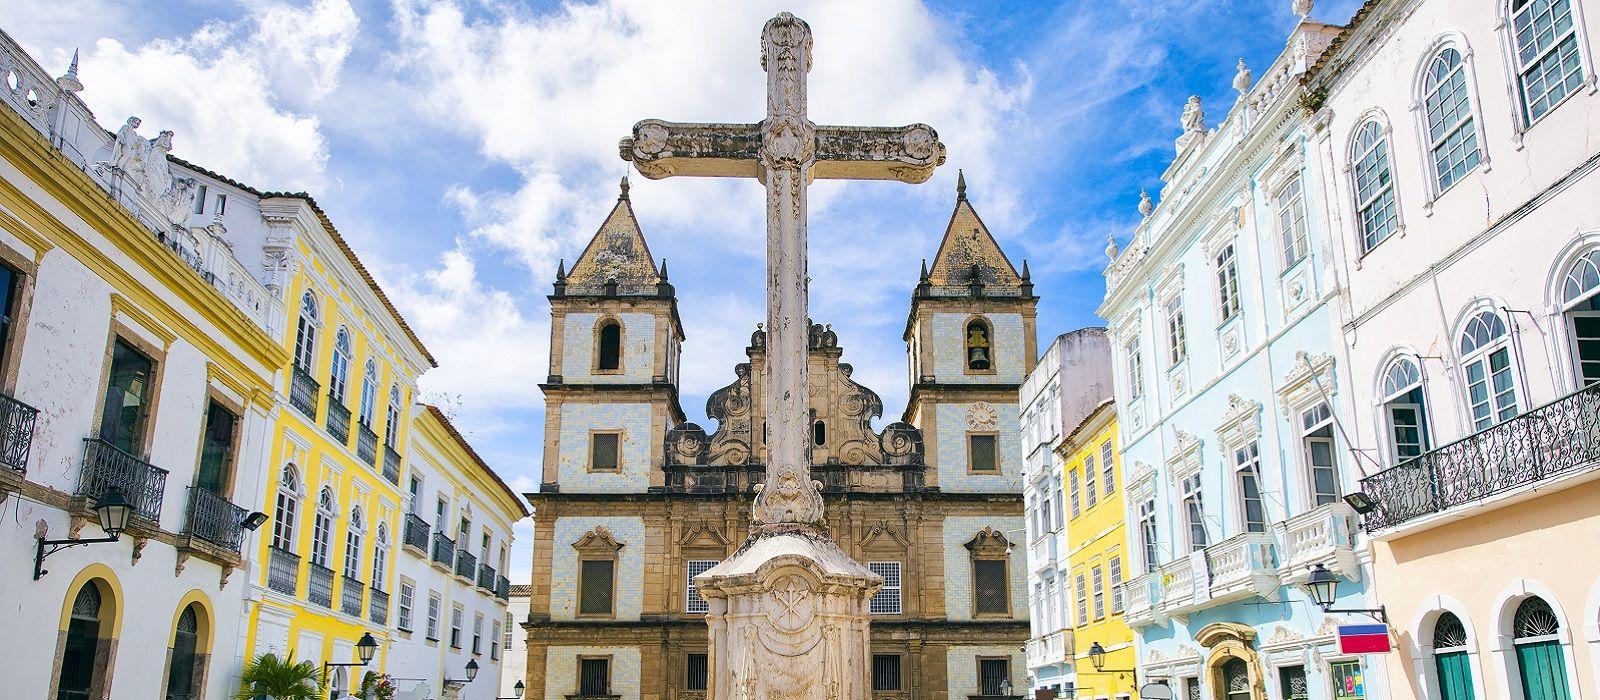 Reiseziel Salvador da Bahia Brasilien